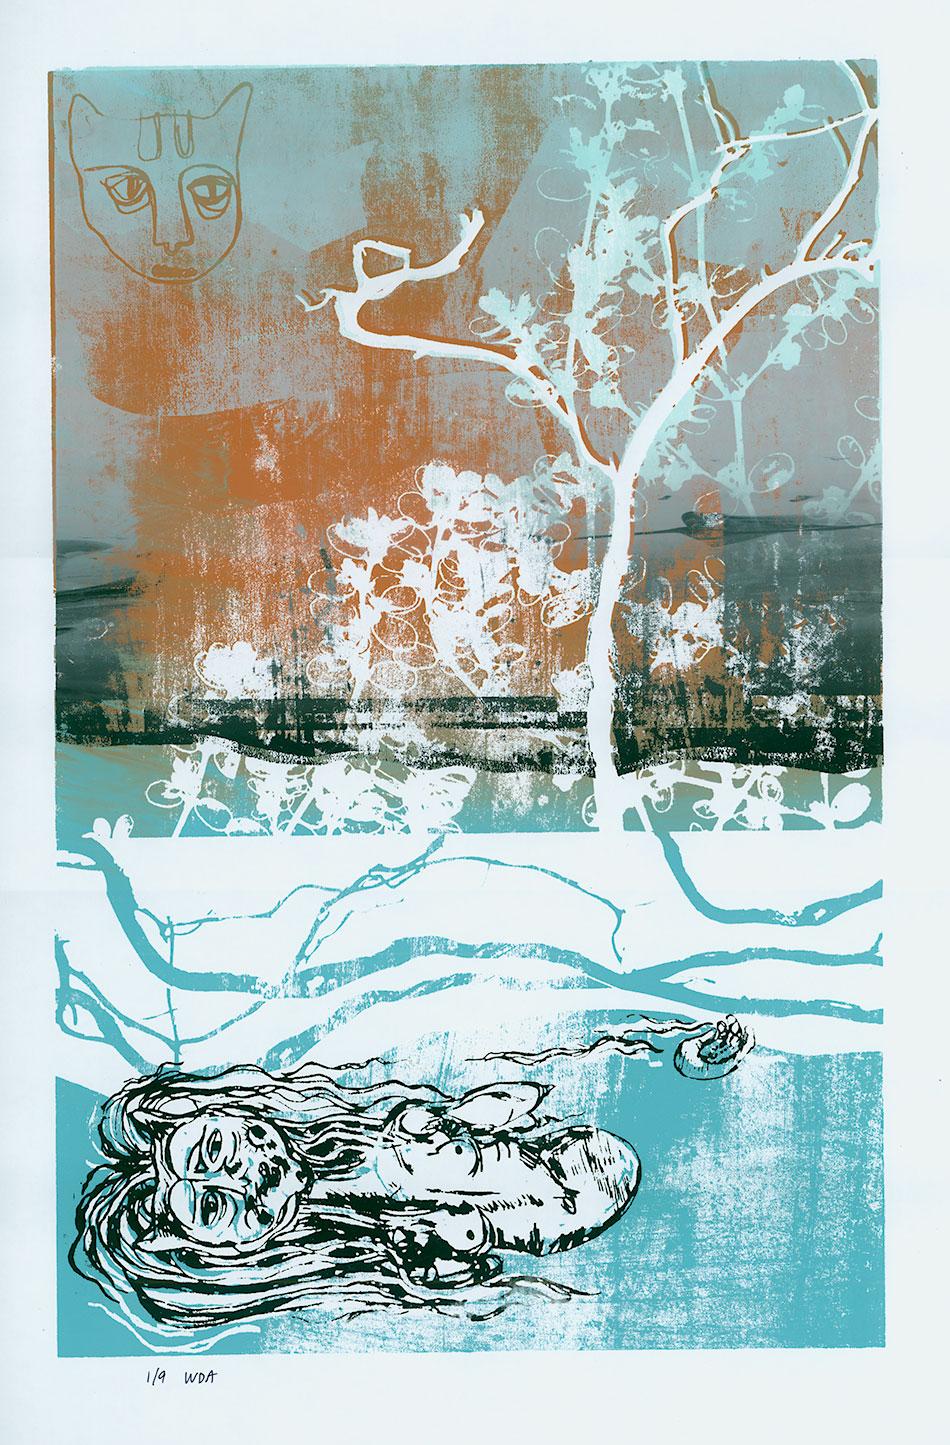 Print: Ophelia by Woodie Anderson